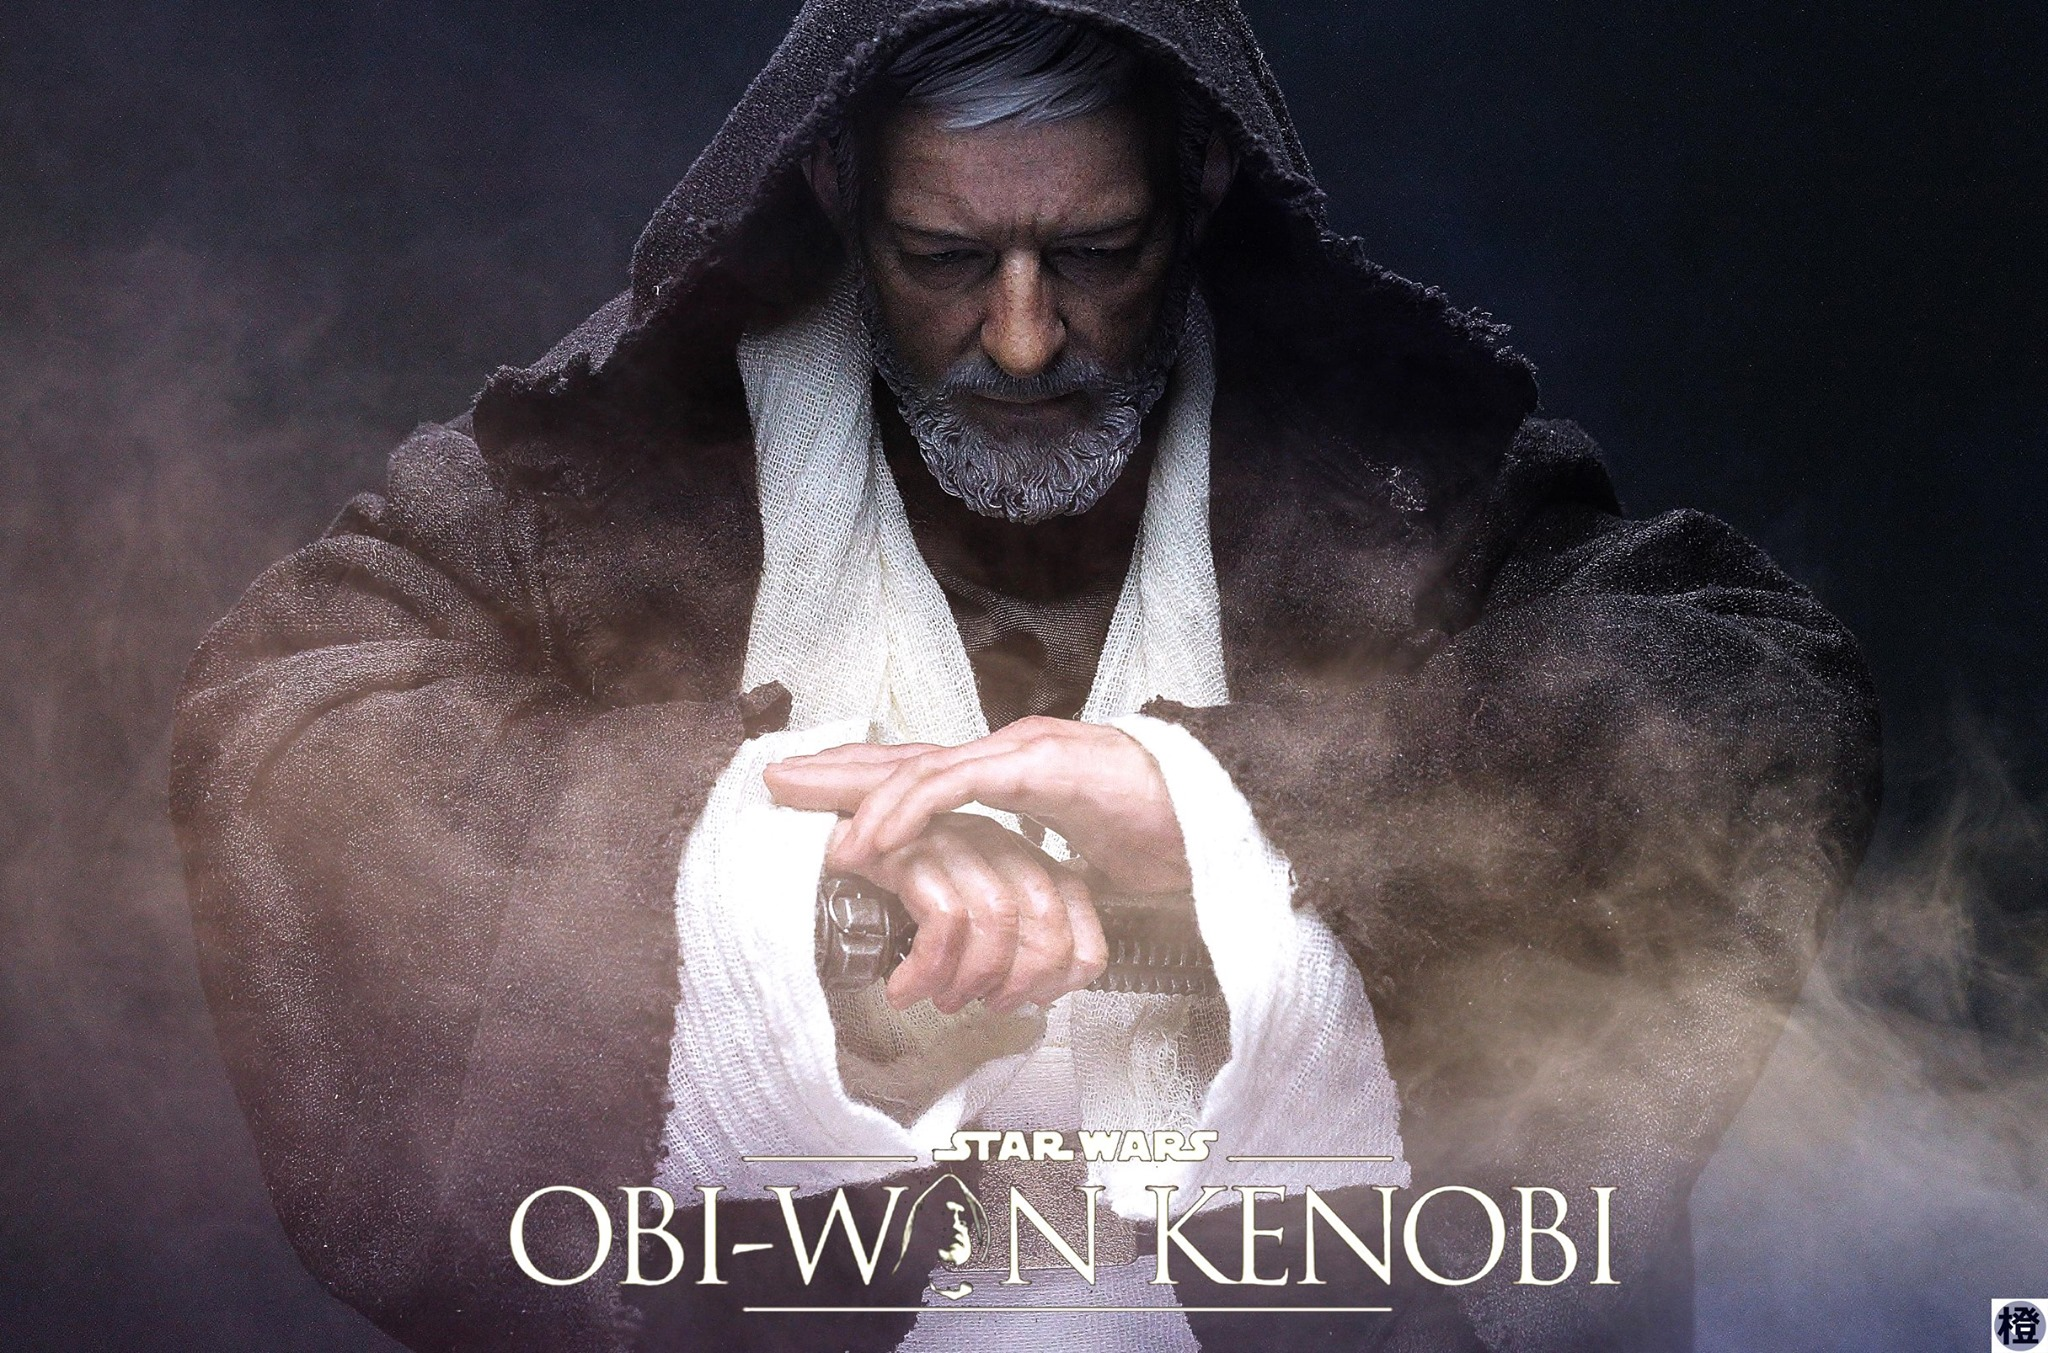 Le point Goodies: Obi-Wan Kenobi, la sagesse en figurine…